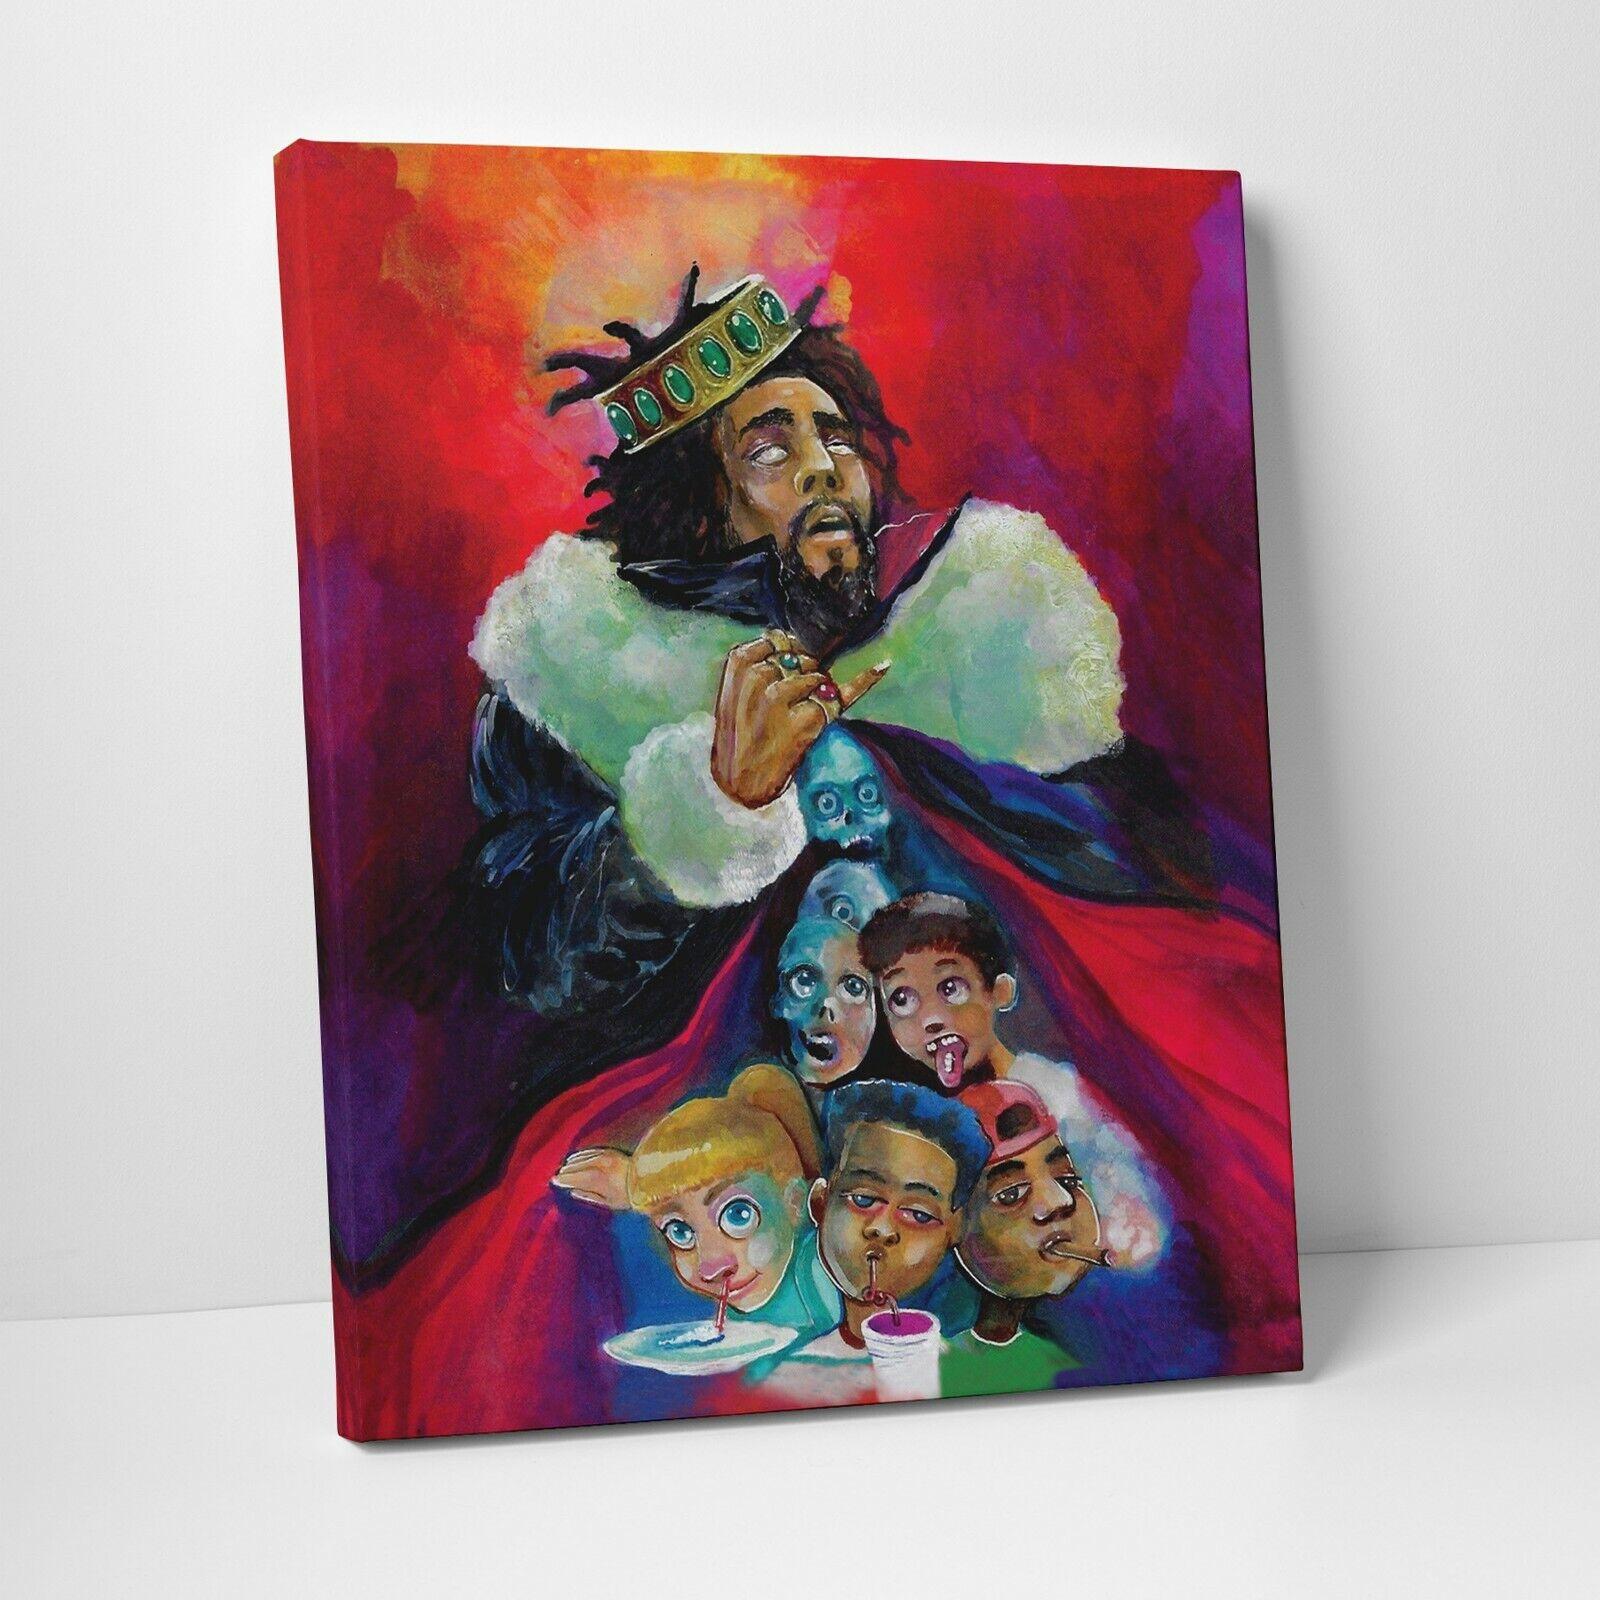 N-172 J Cole Poster KOD Music Tour Hip Hop Rap Music Wall Decor